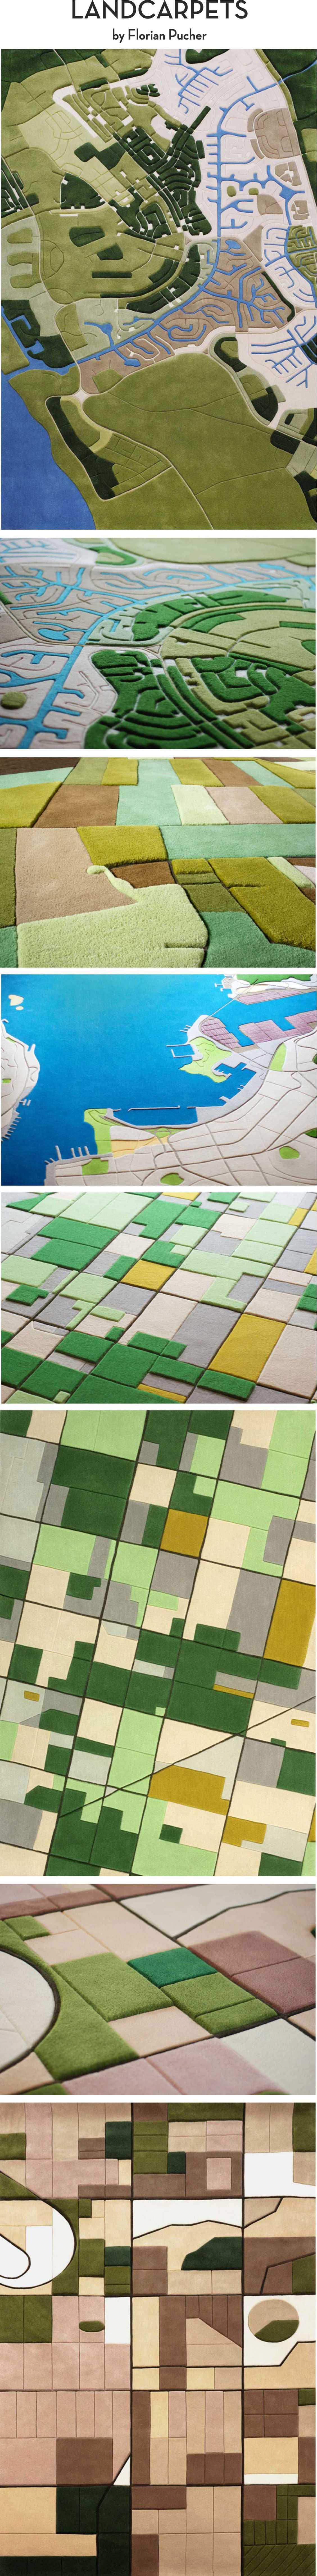 Landcarpets